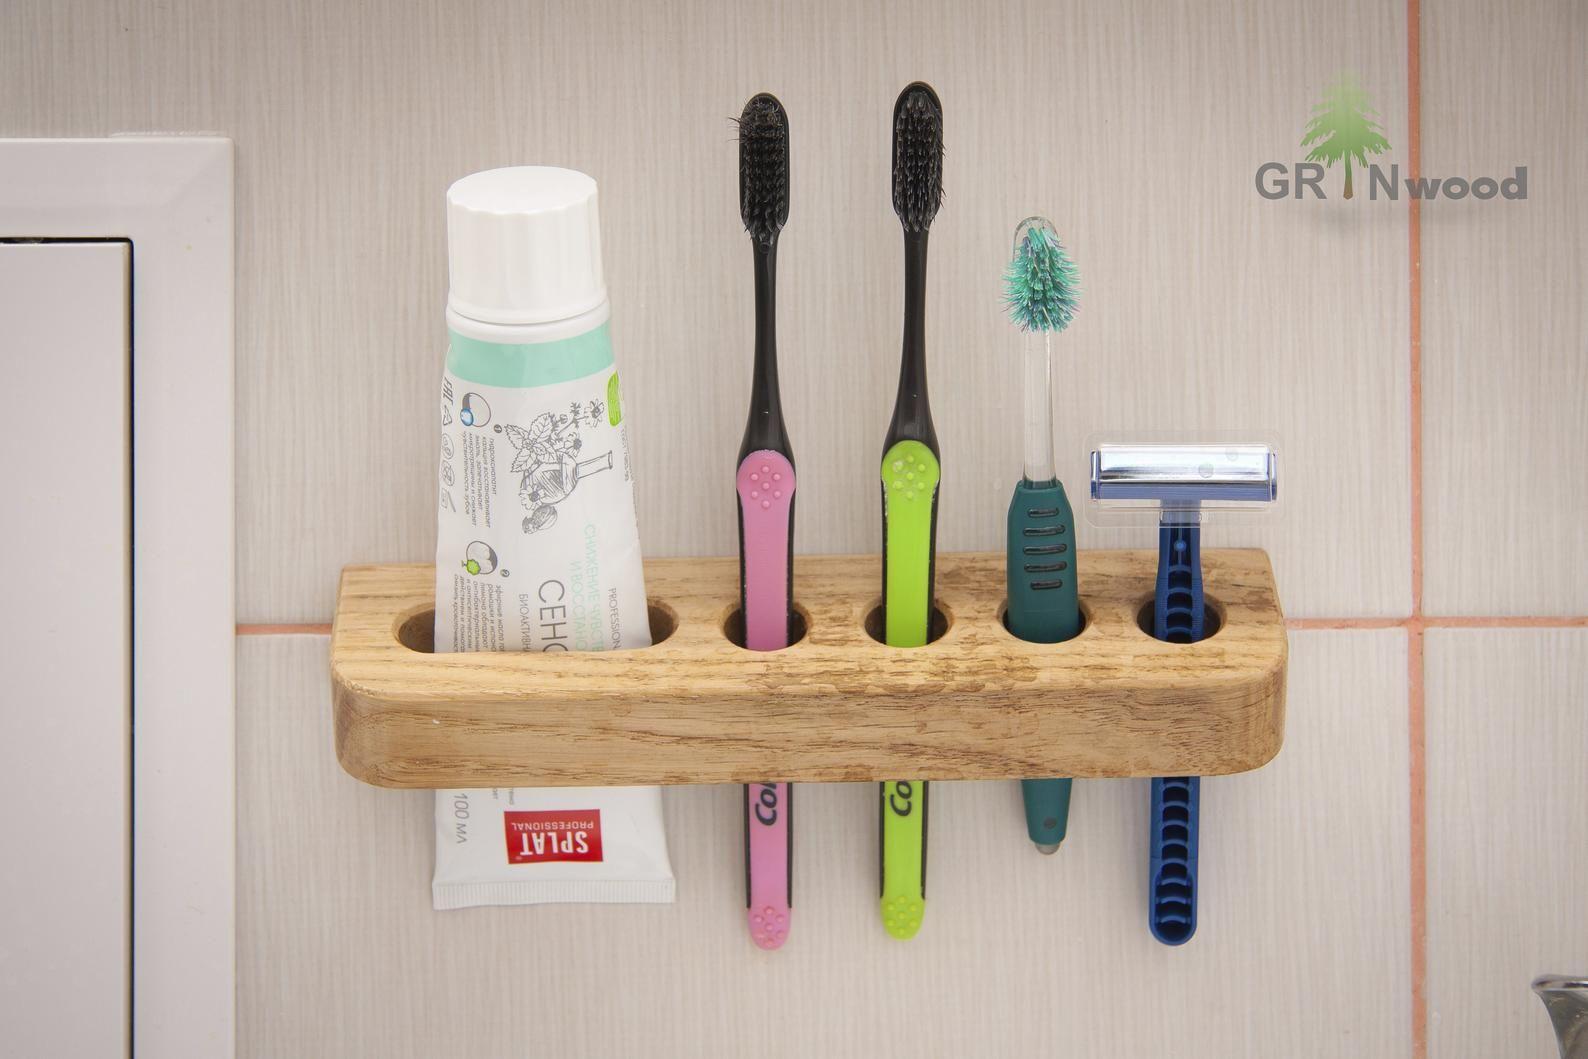 Toothbrush Holder Wall Handmade Wooden Toothbrush Holder Etsy In 2020 Toothbrush Holder Wall Wooden Toothbrush Toothbrush And Toothpaste Holder